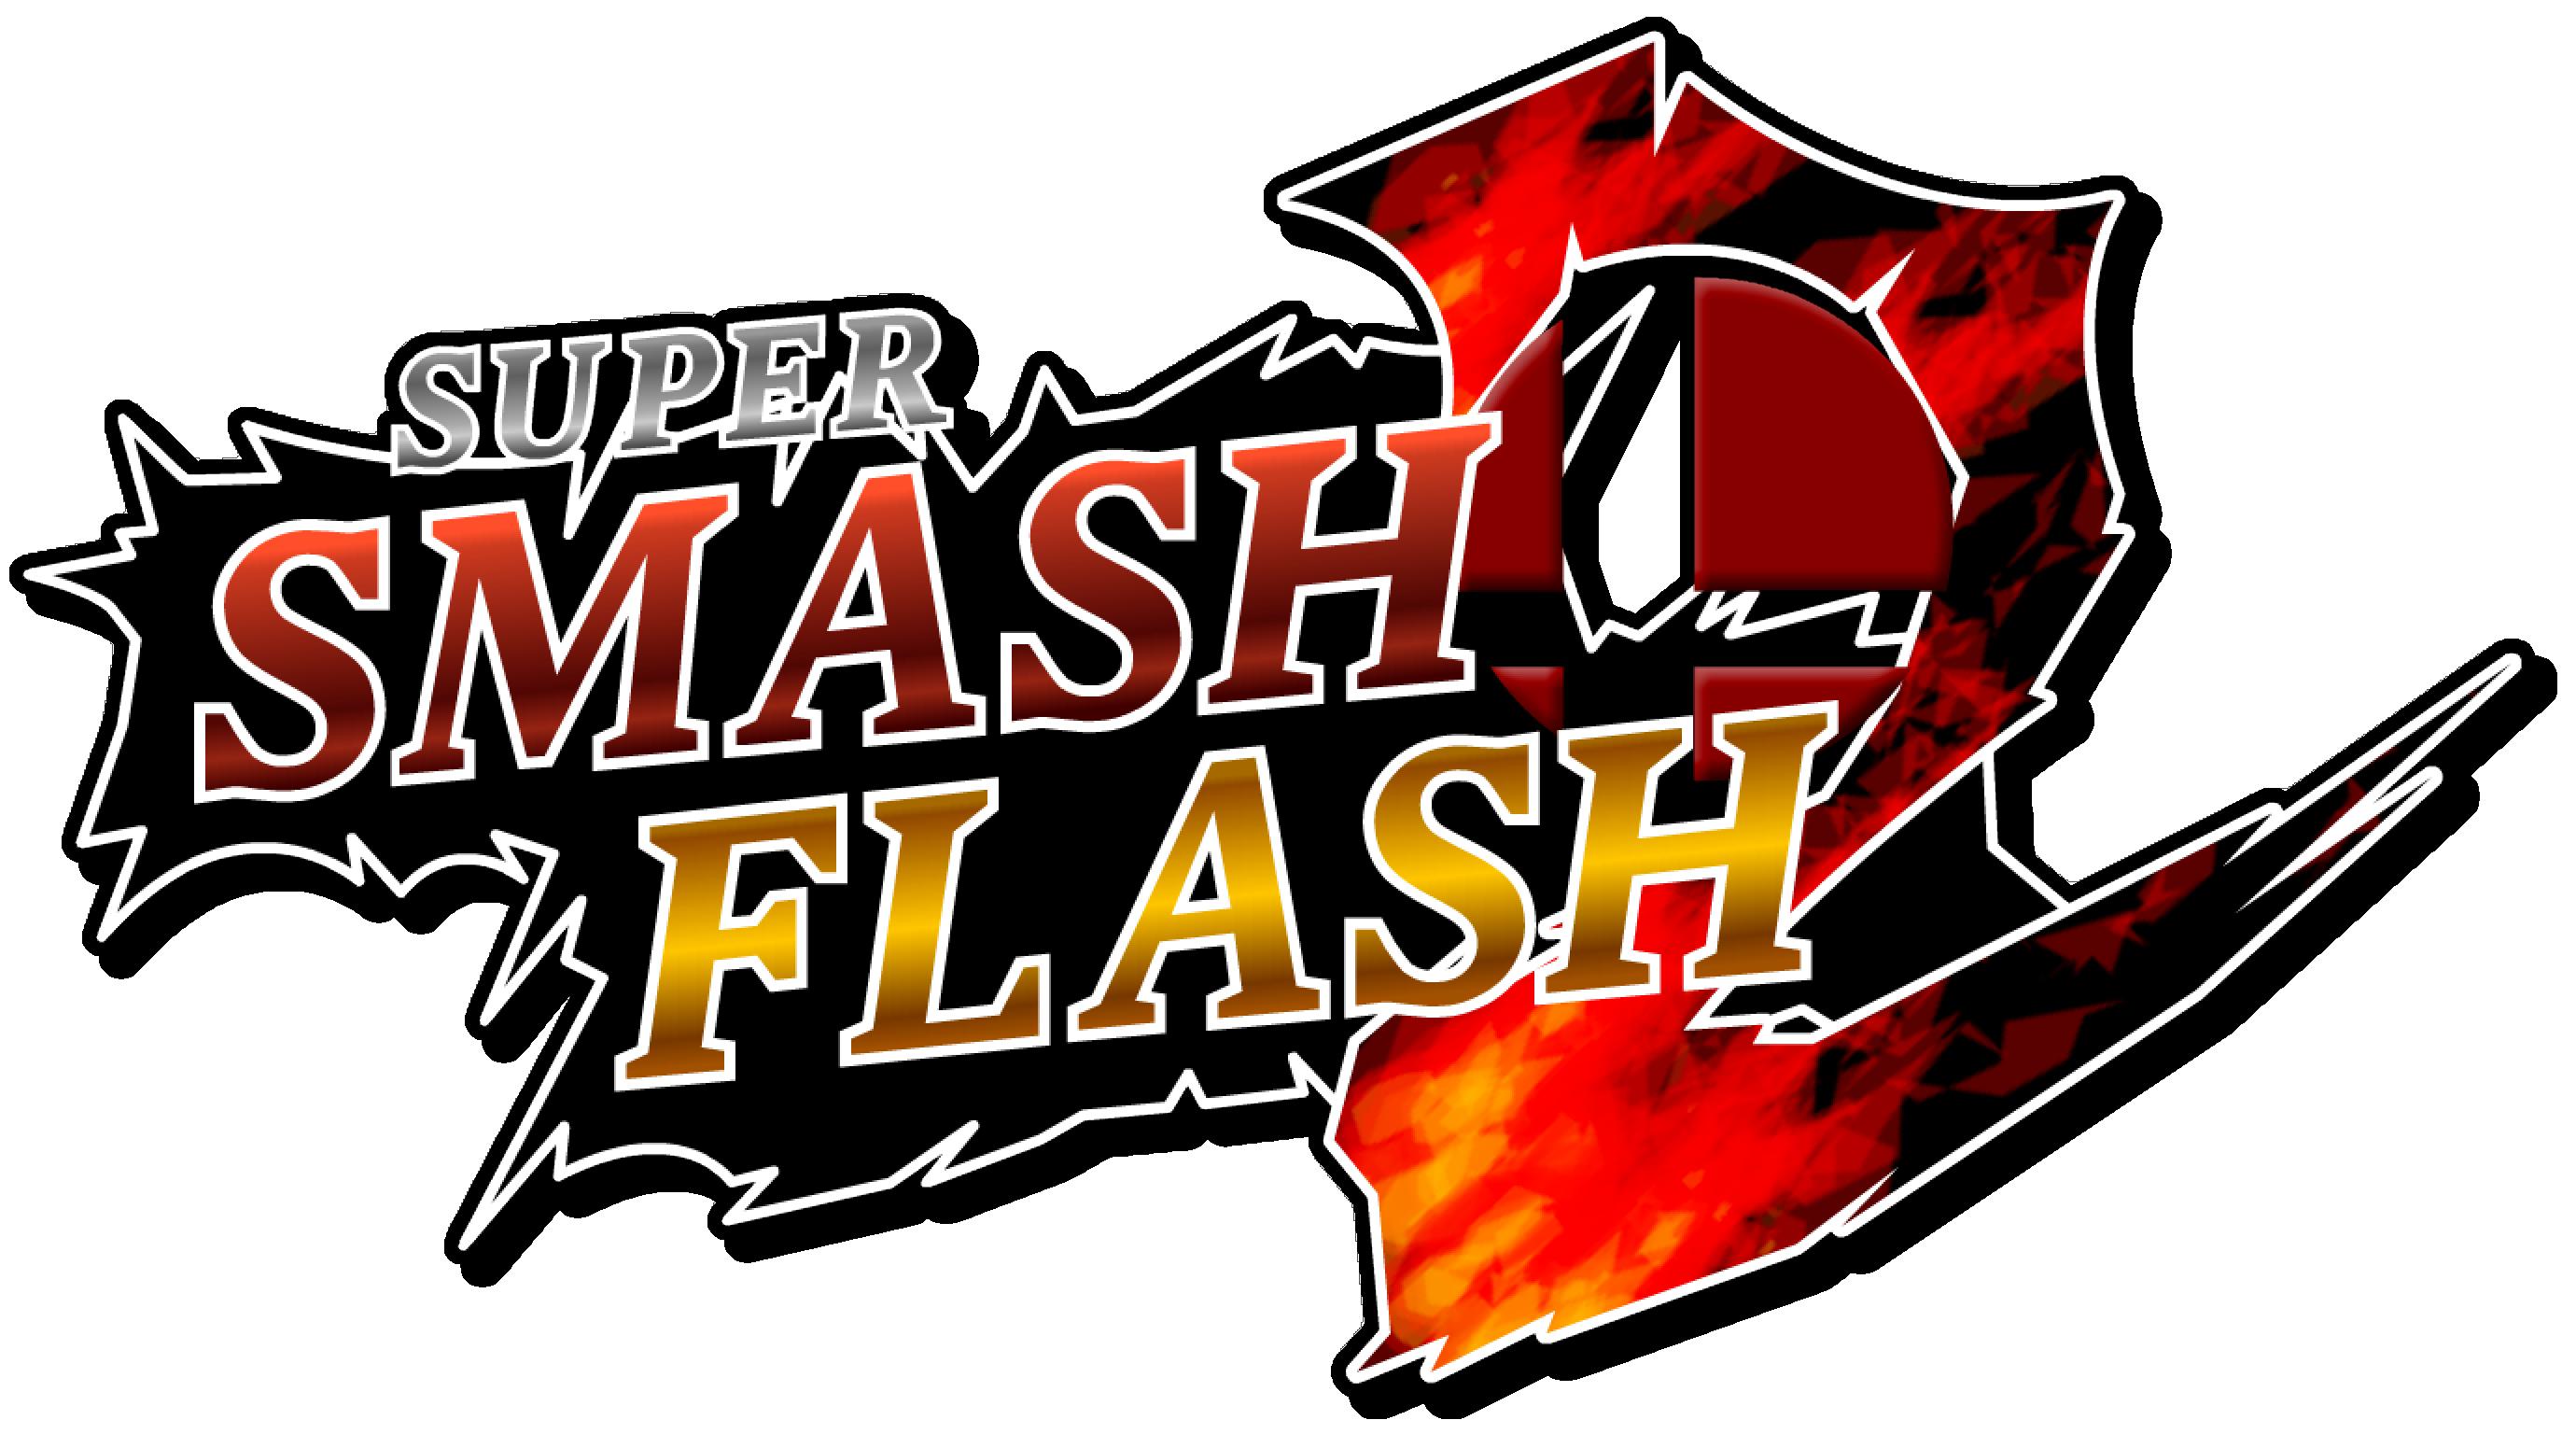 Smash spotlight soldiersunday the. Flash clipart super fast